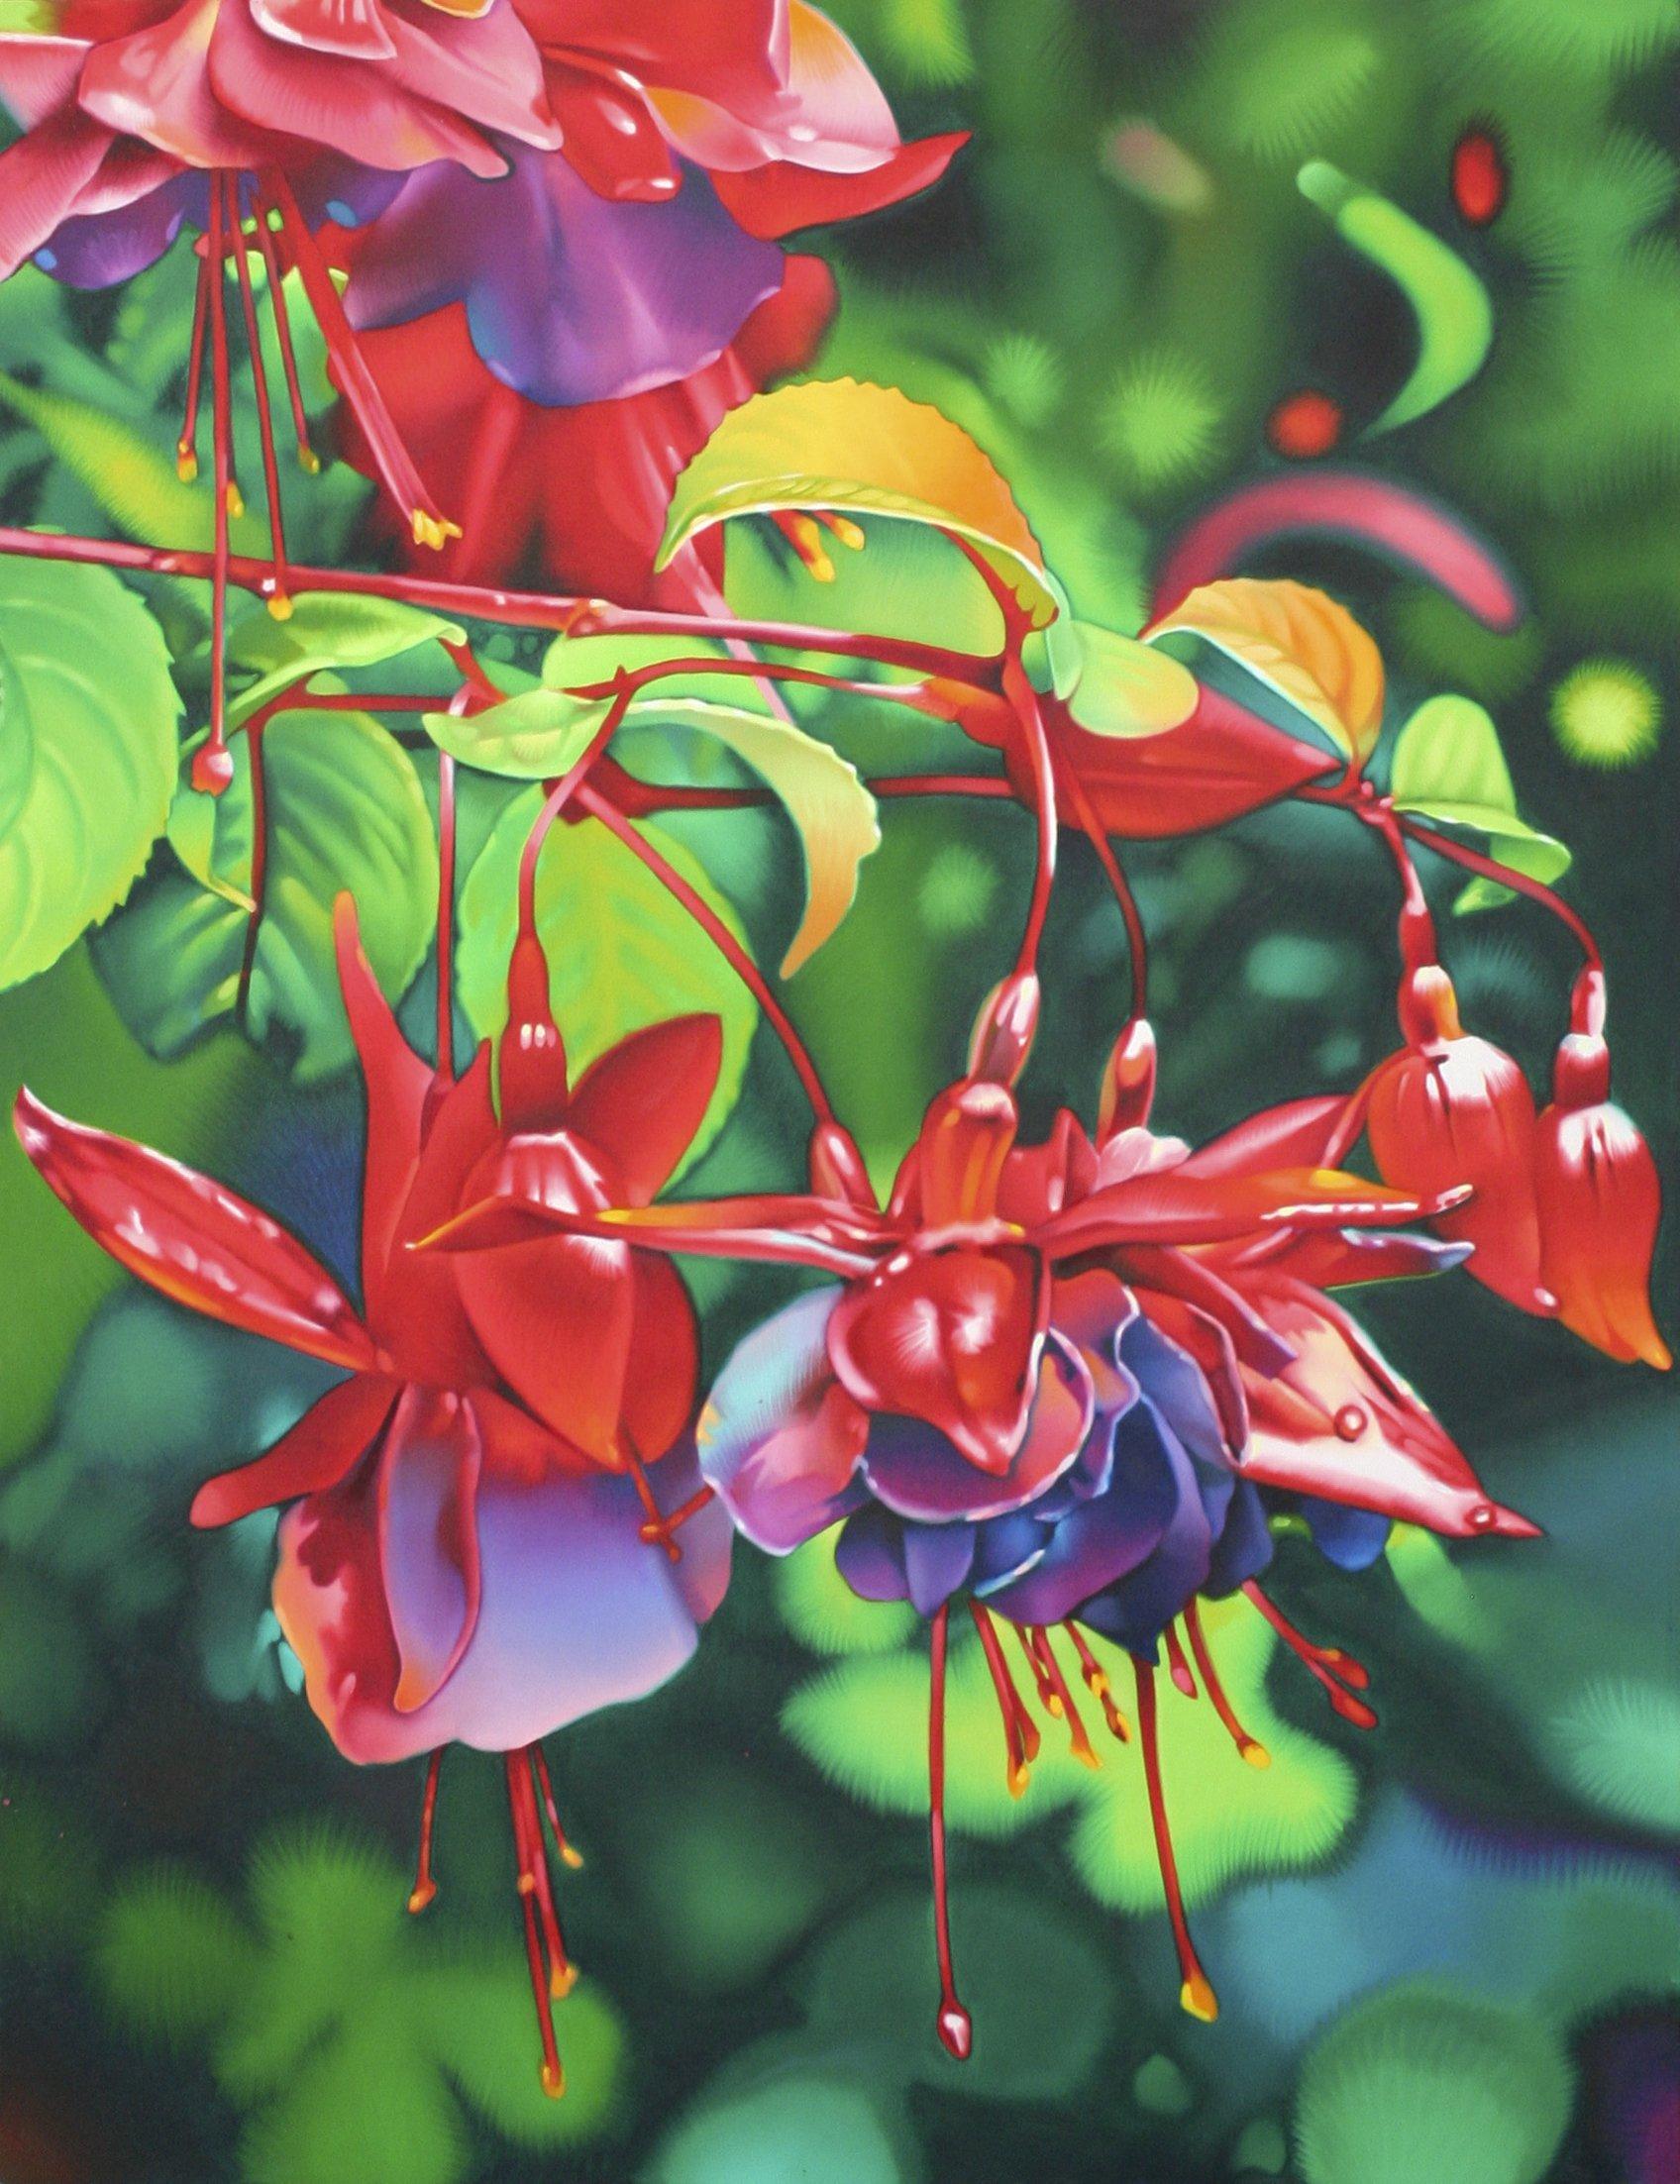 Pruner, Gary – Fuchsia Branch